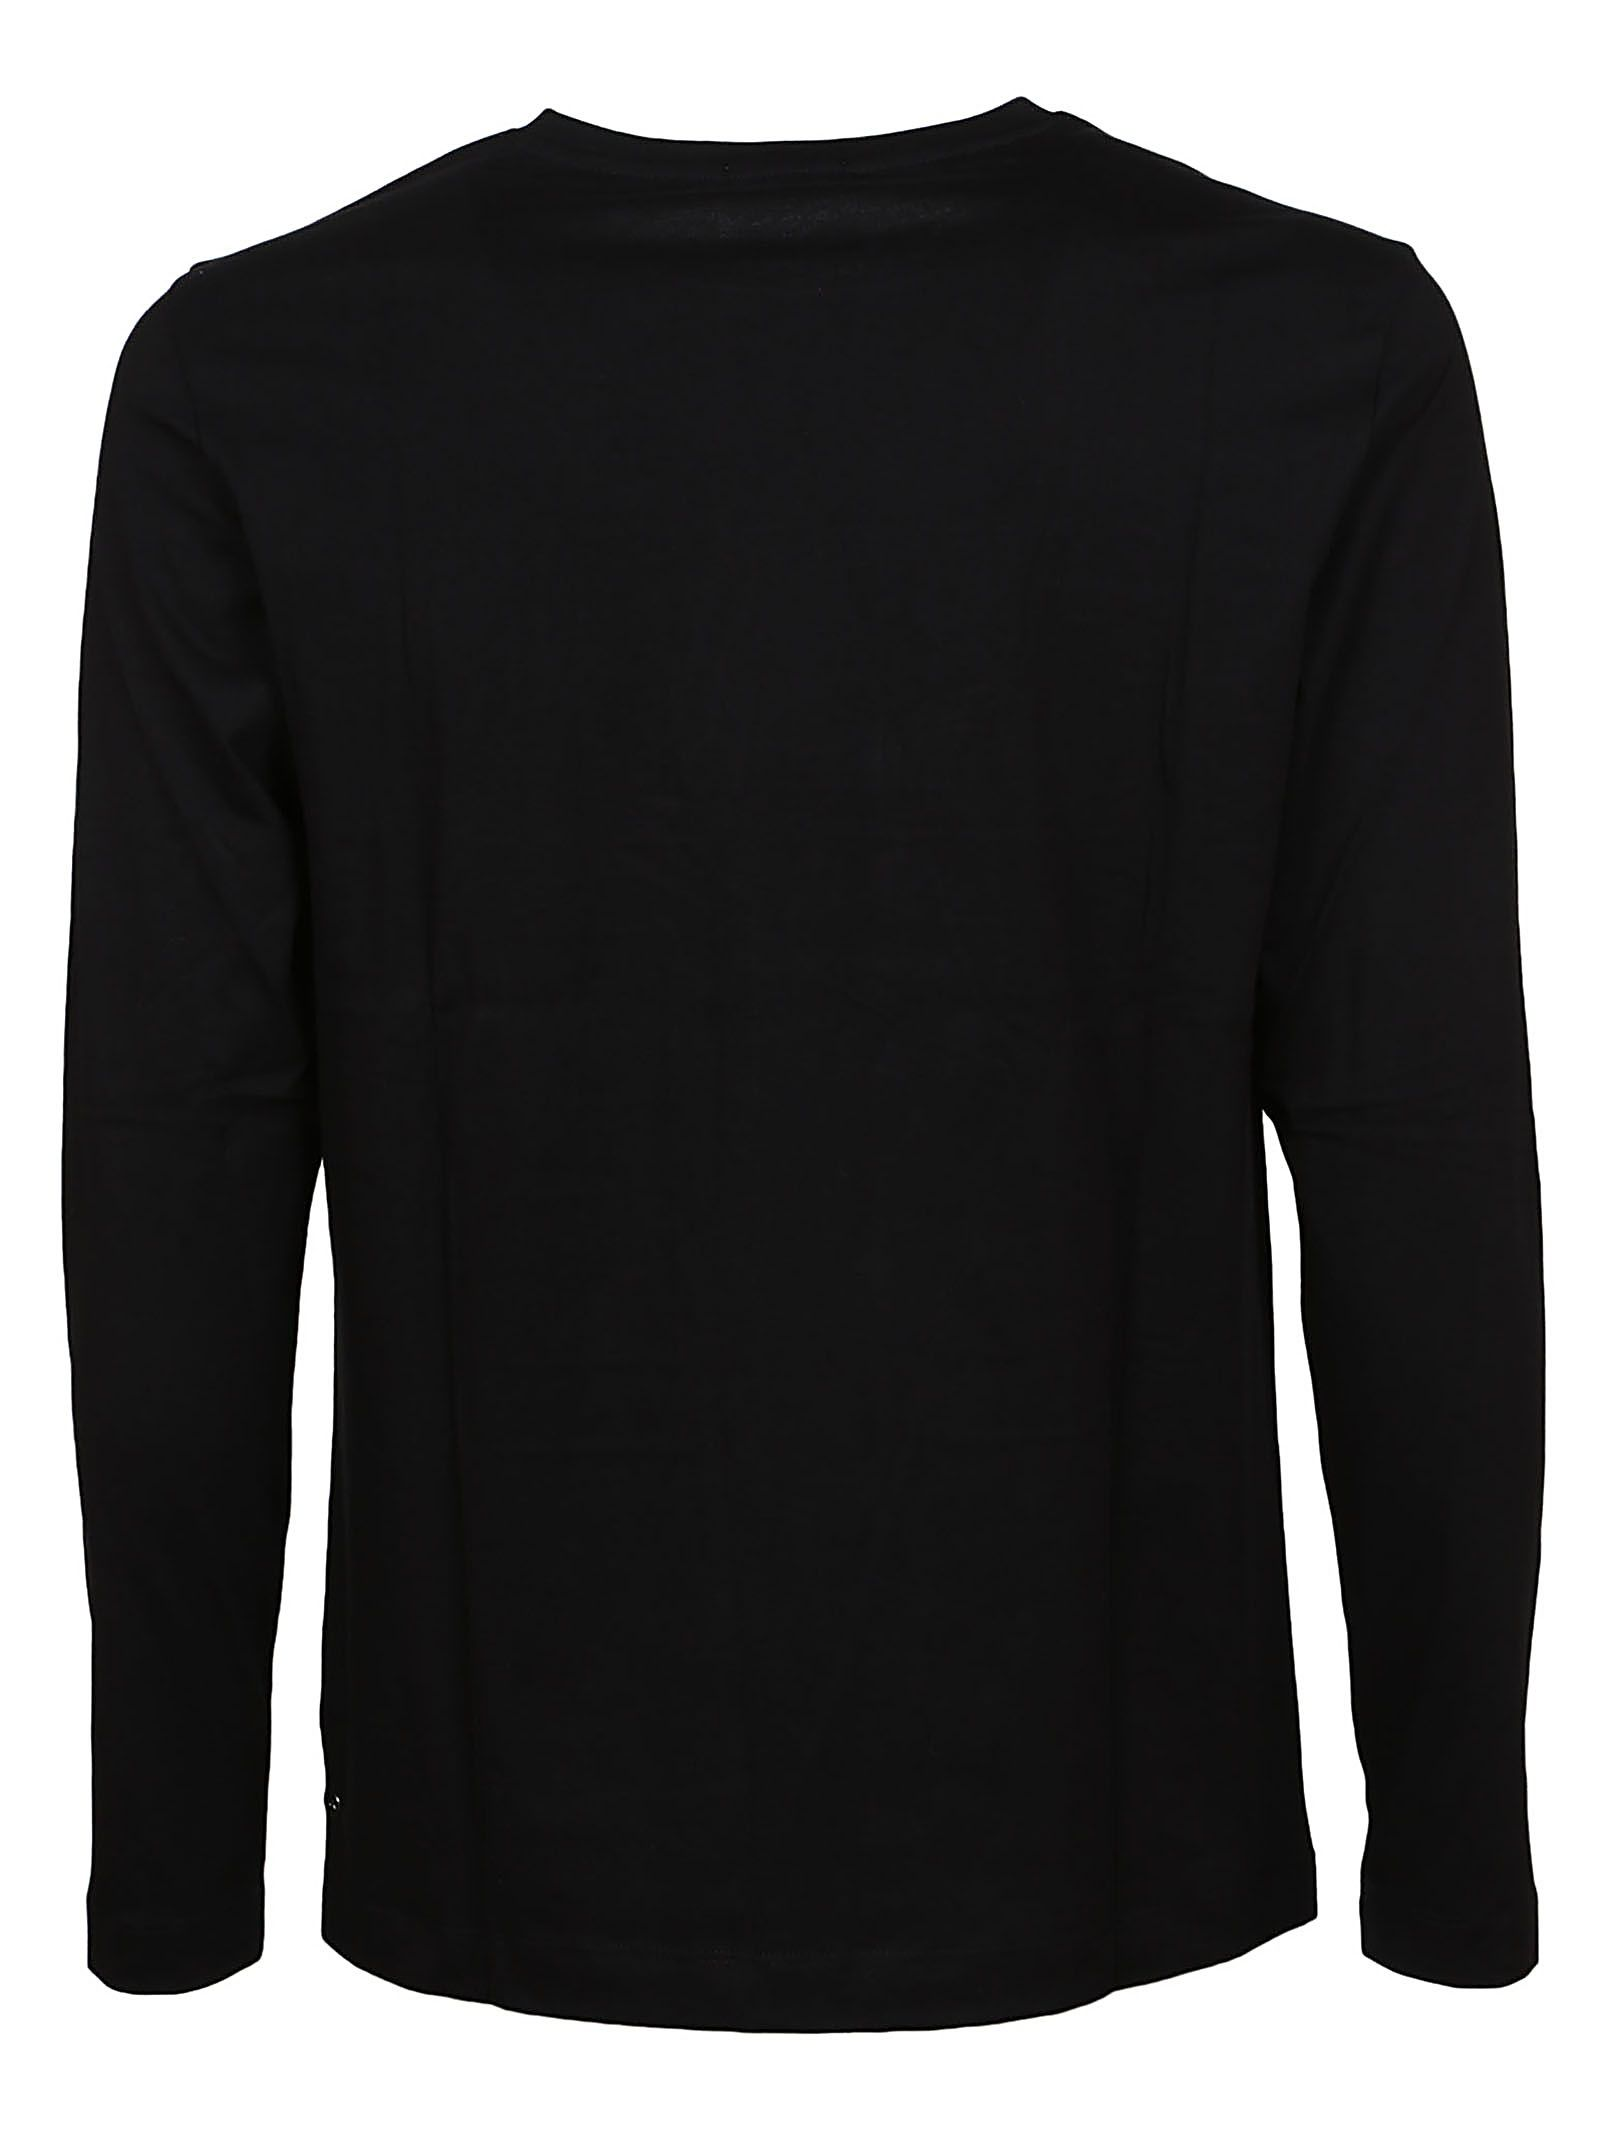 calvin klein t shirt price